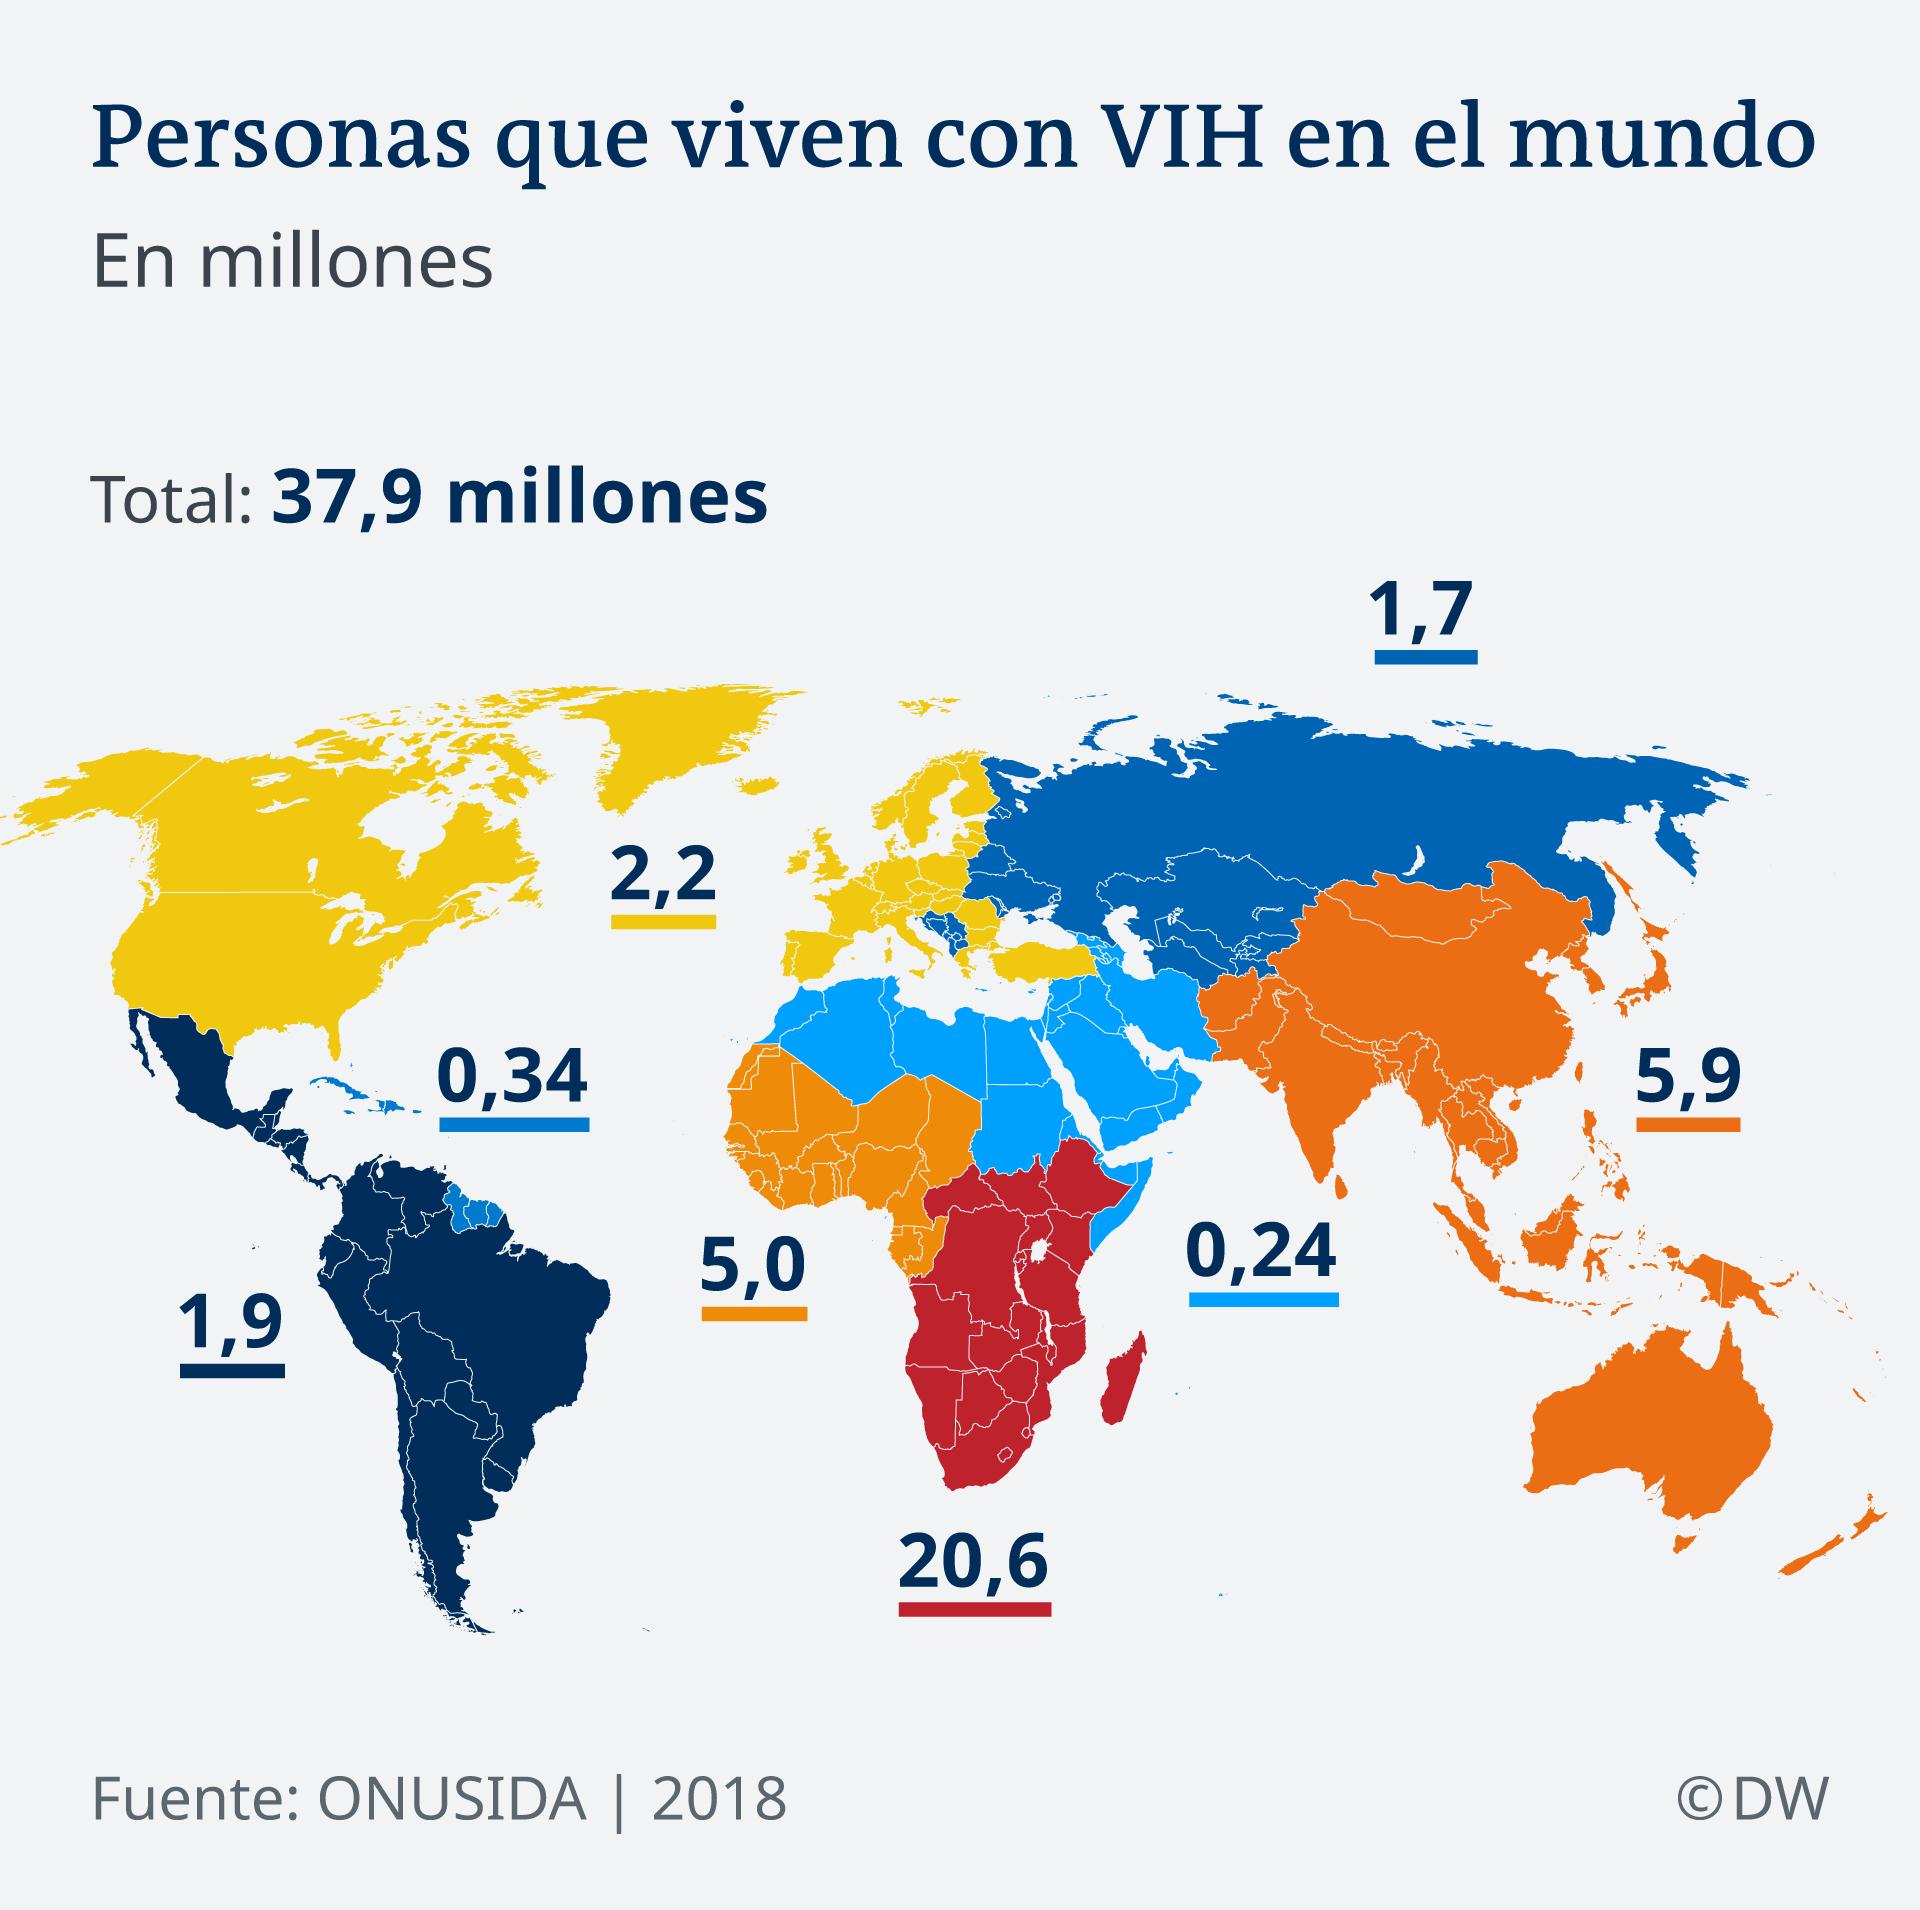 آمار مبتلایان به ویروس اچ آی وی به میلیون